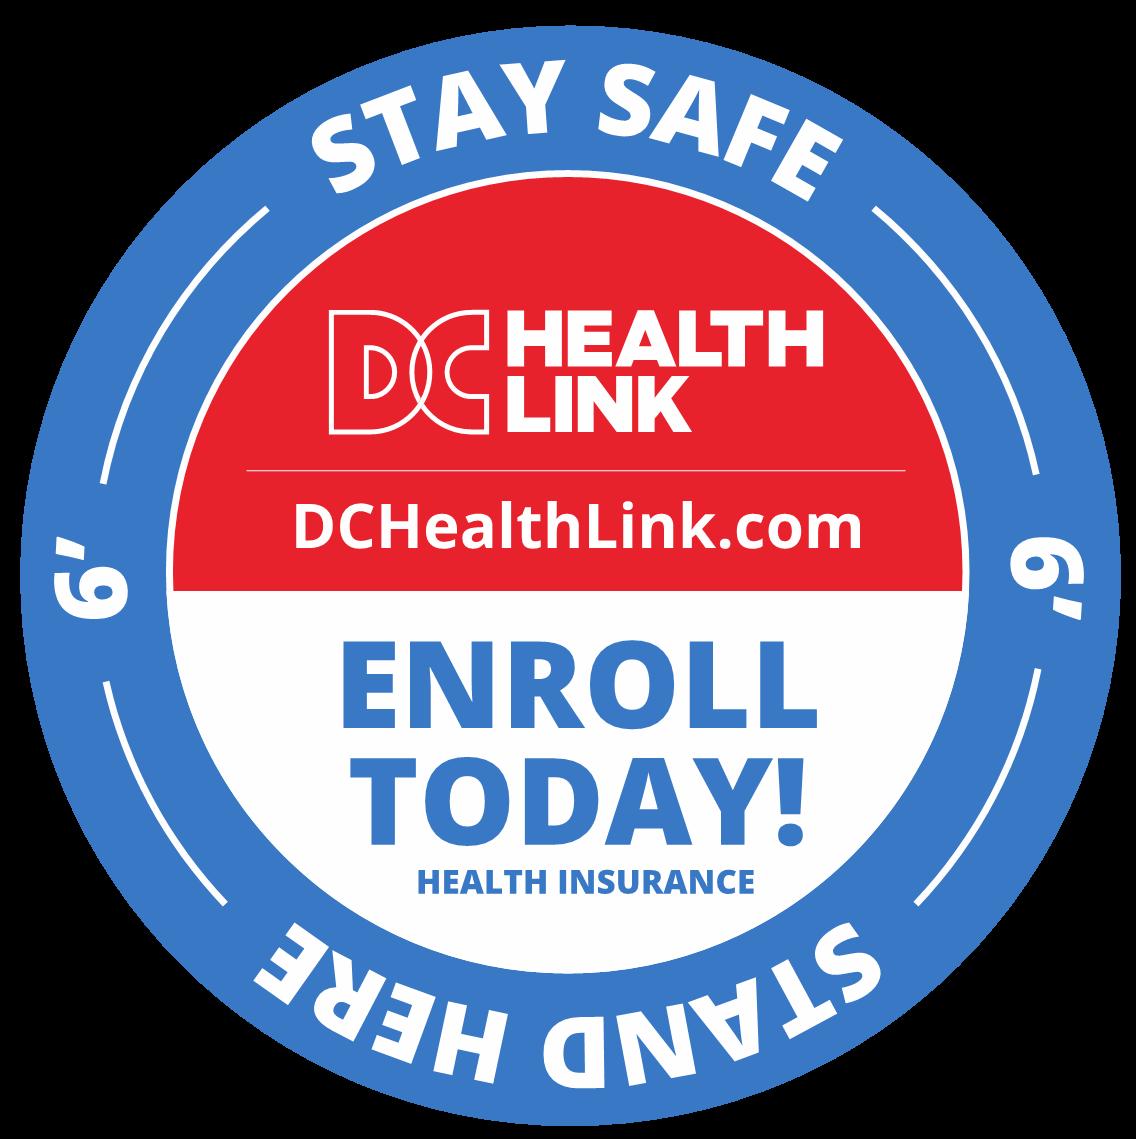 DC Health Link Offers Social Distancing Decals ...